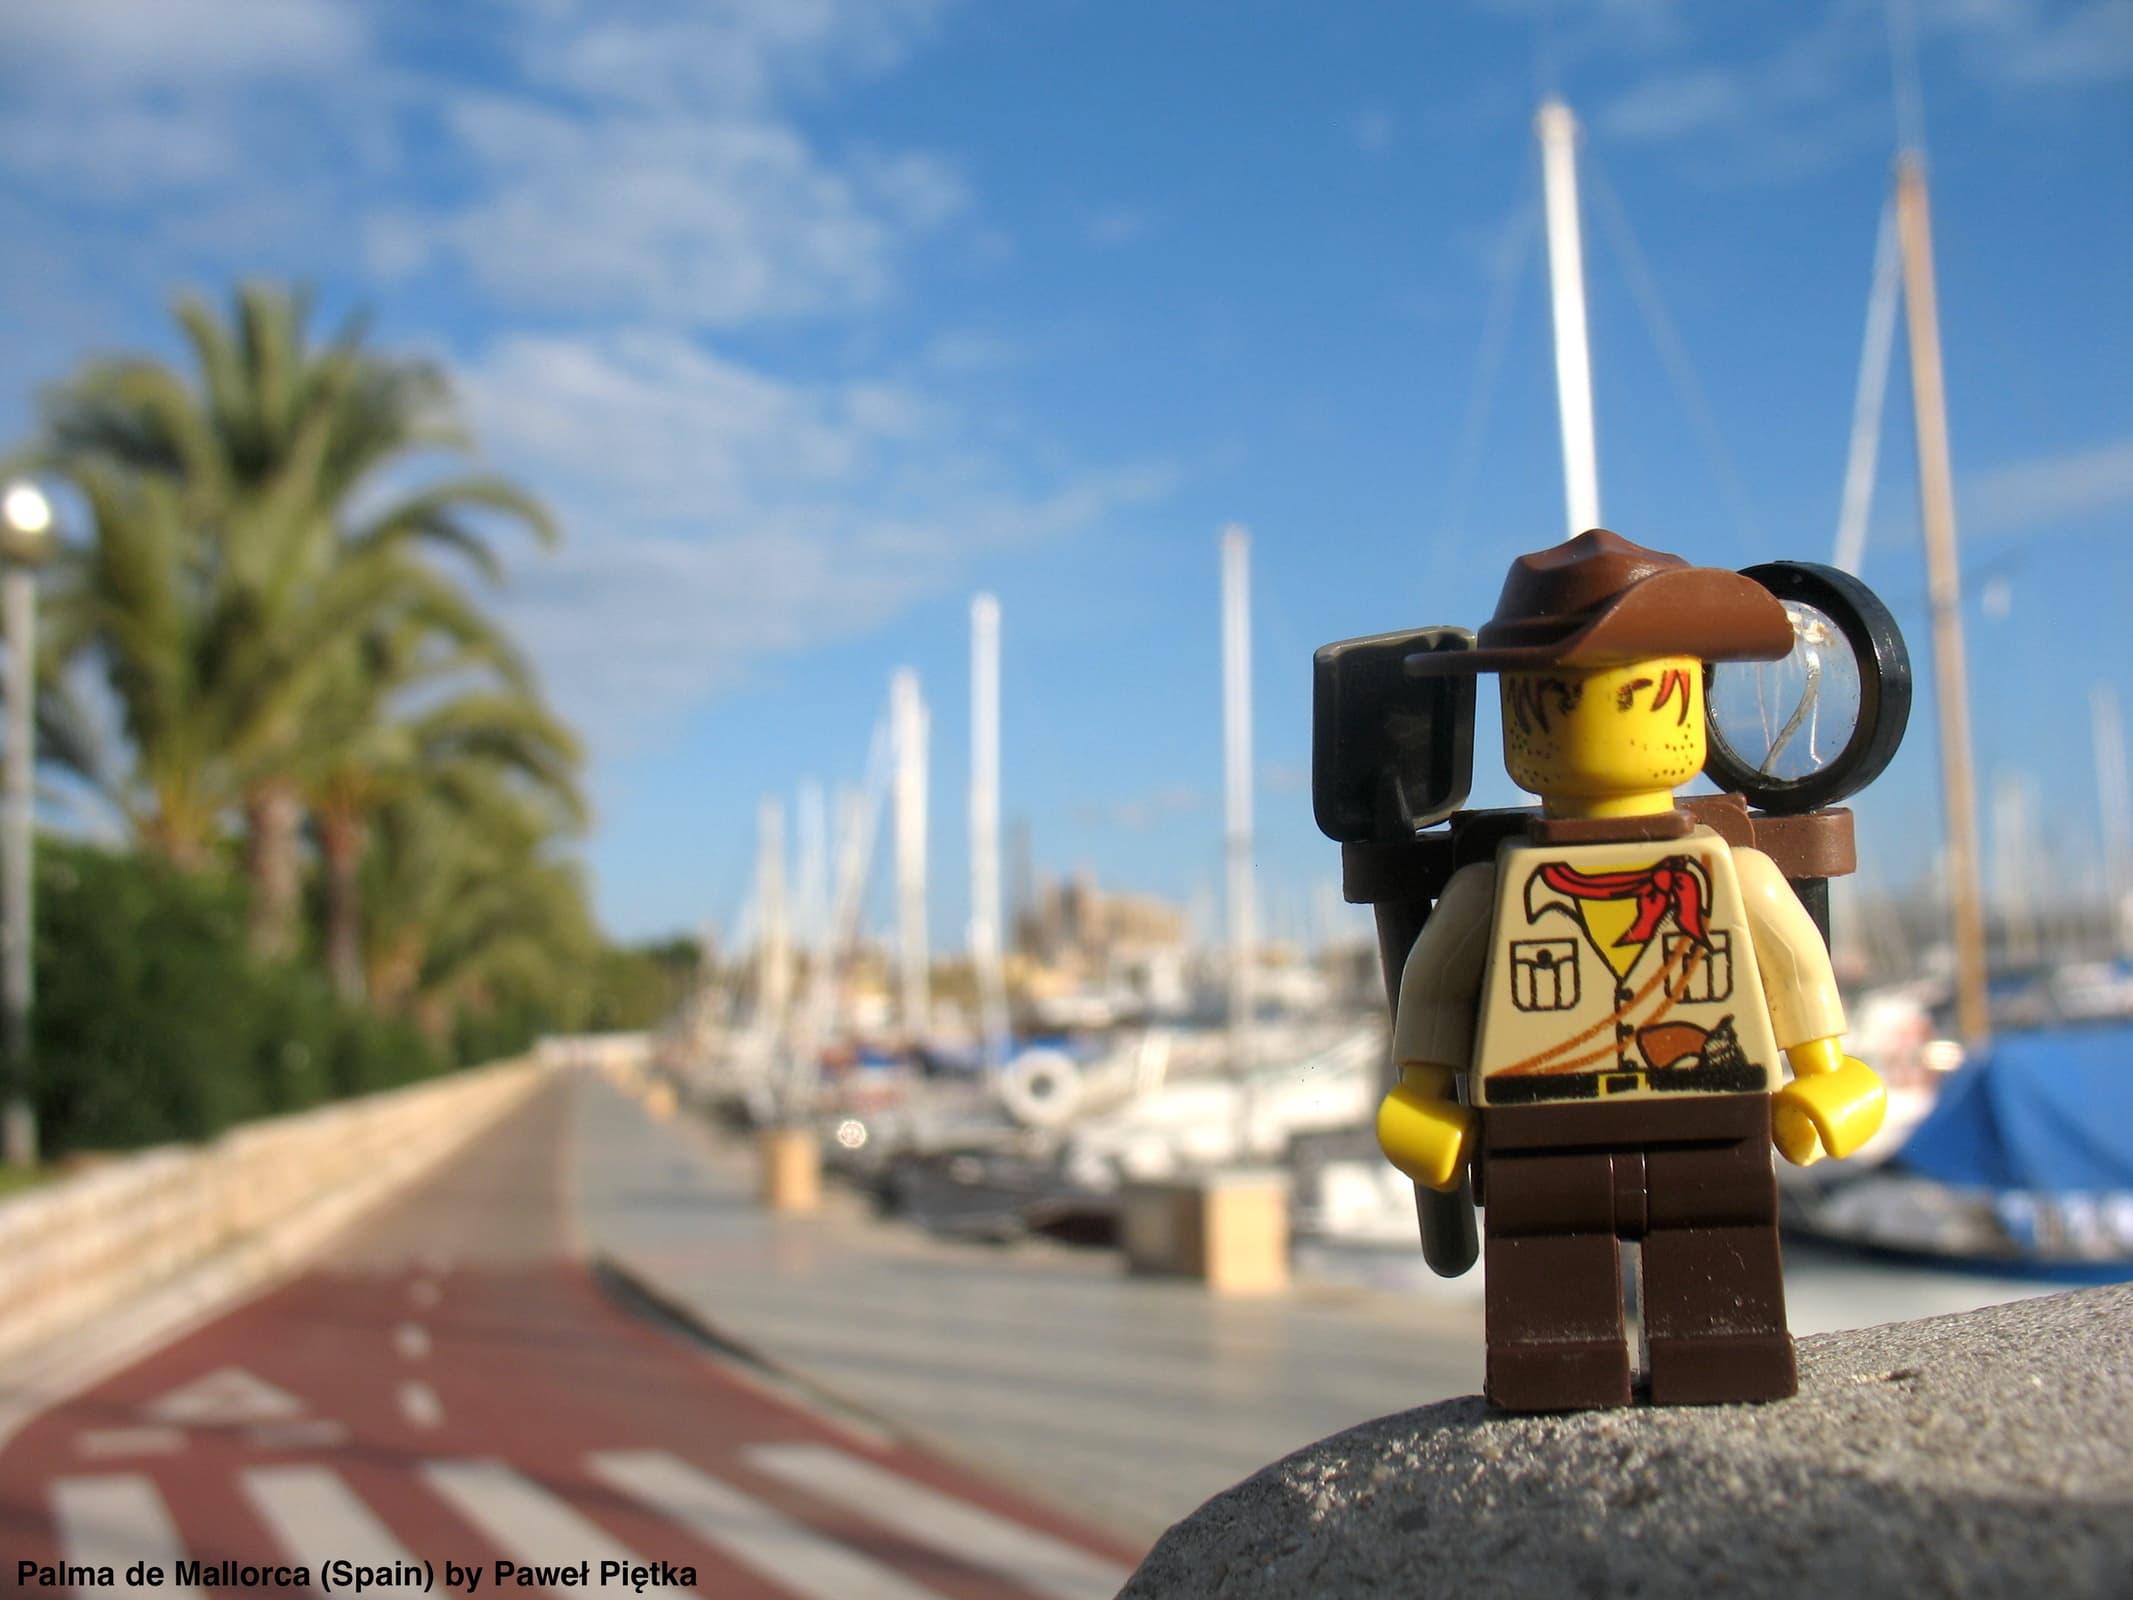 Palma de Mallorca (Spain) - Harbour of Palma